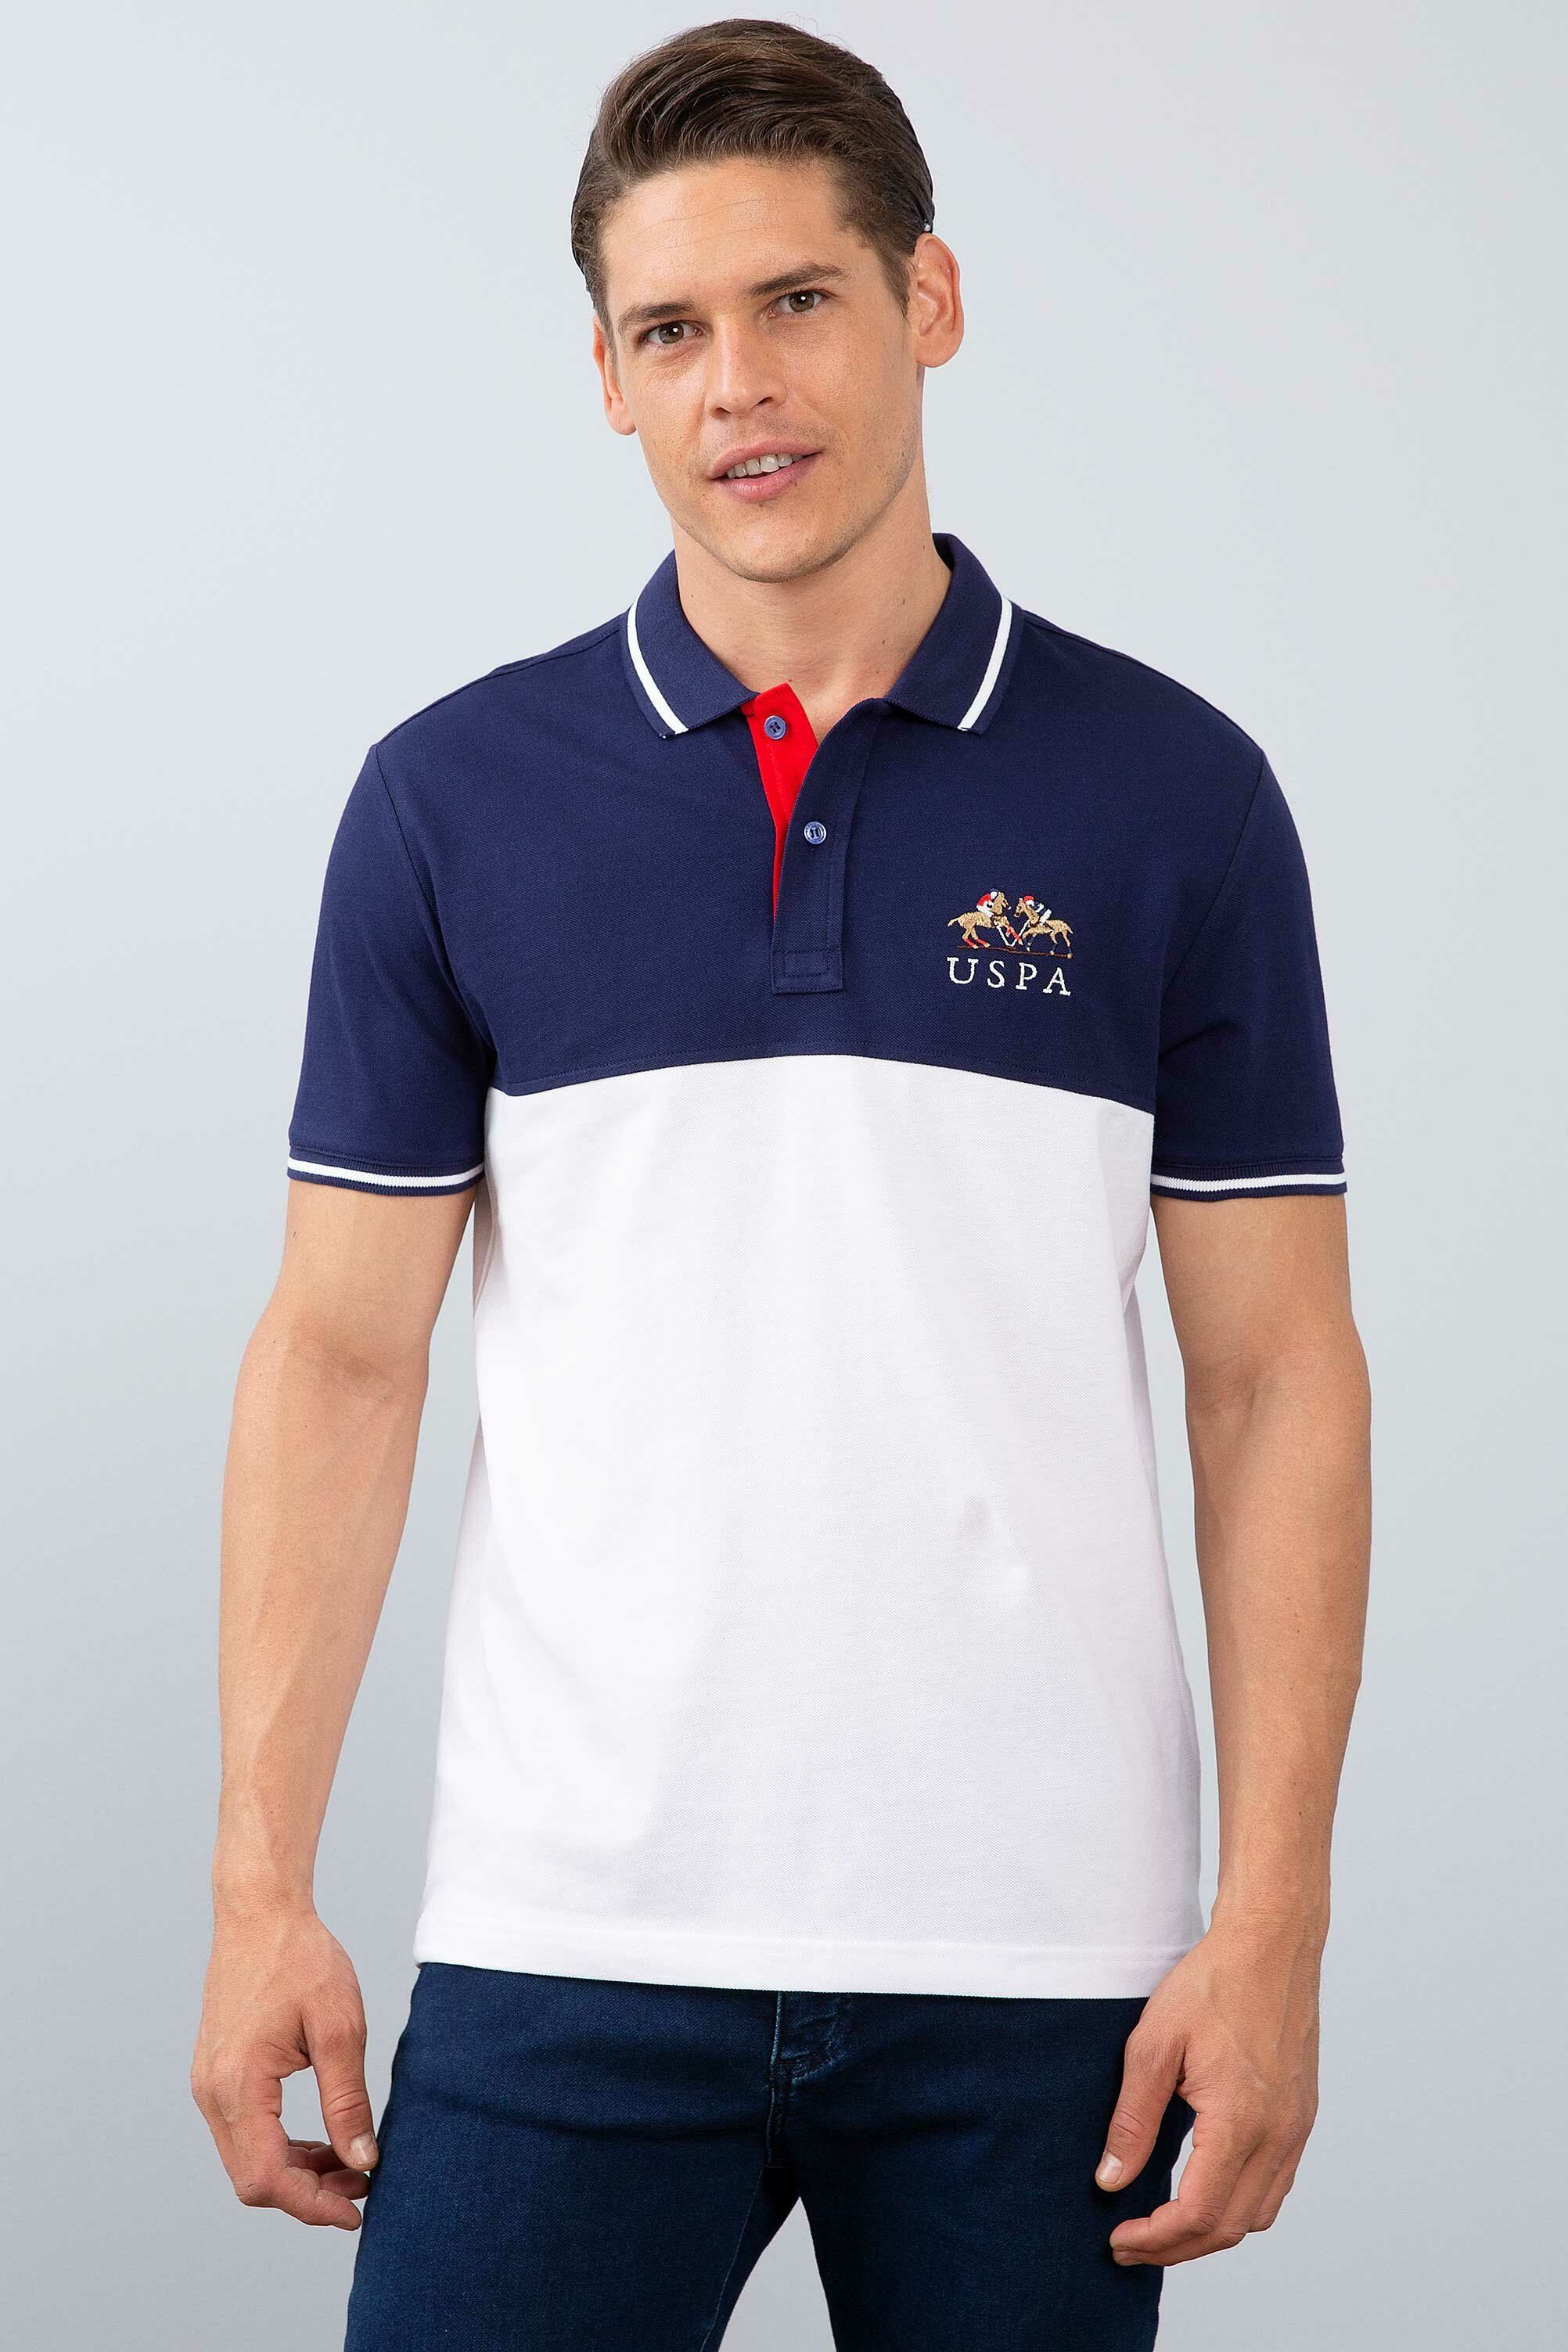 Uspa T Shirt For Men Mens Shirts Mens Tshirts Mens Tops